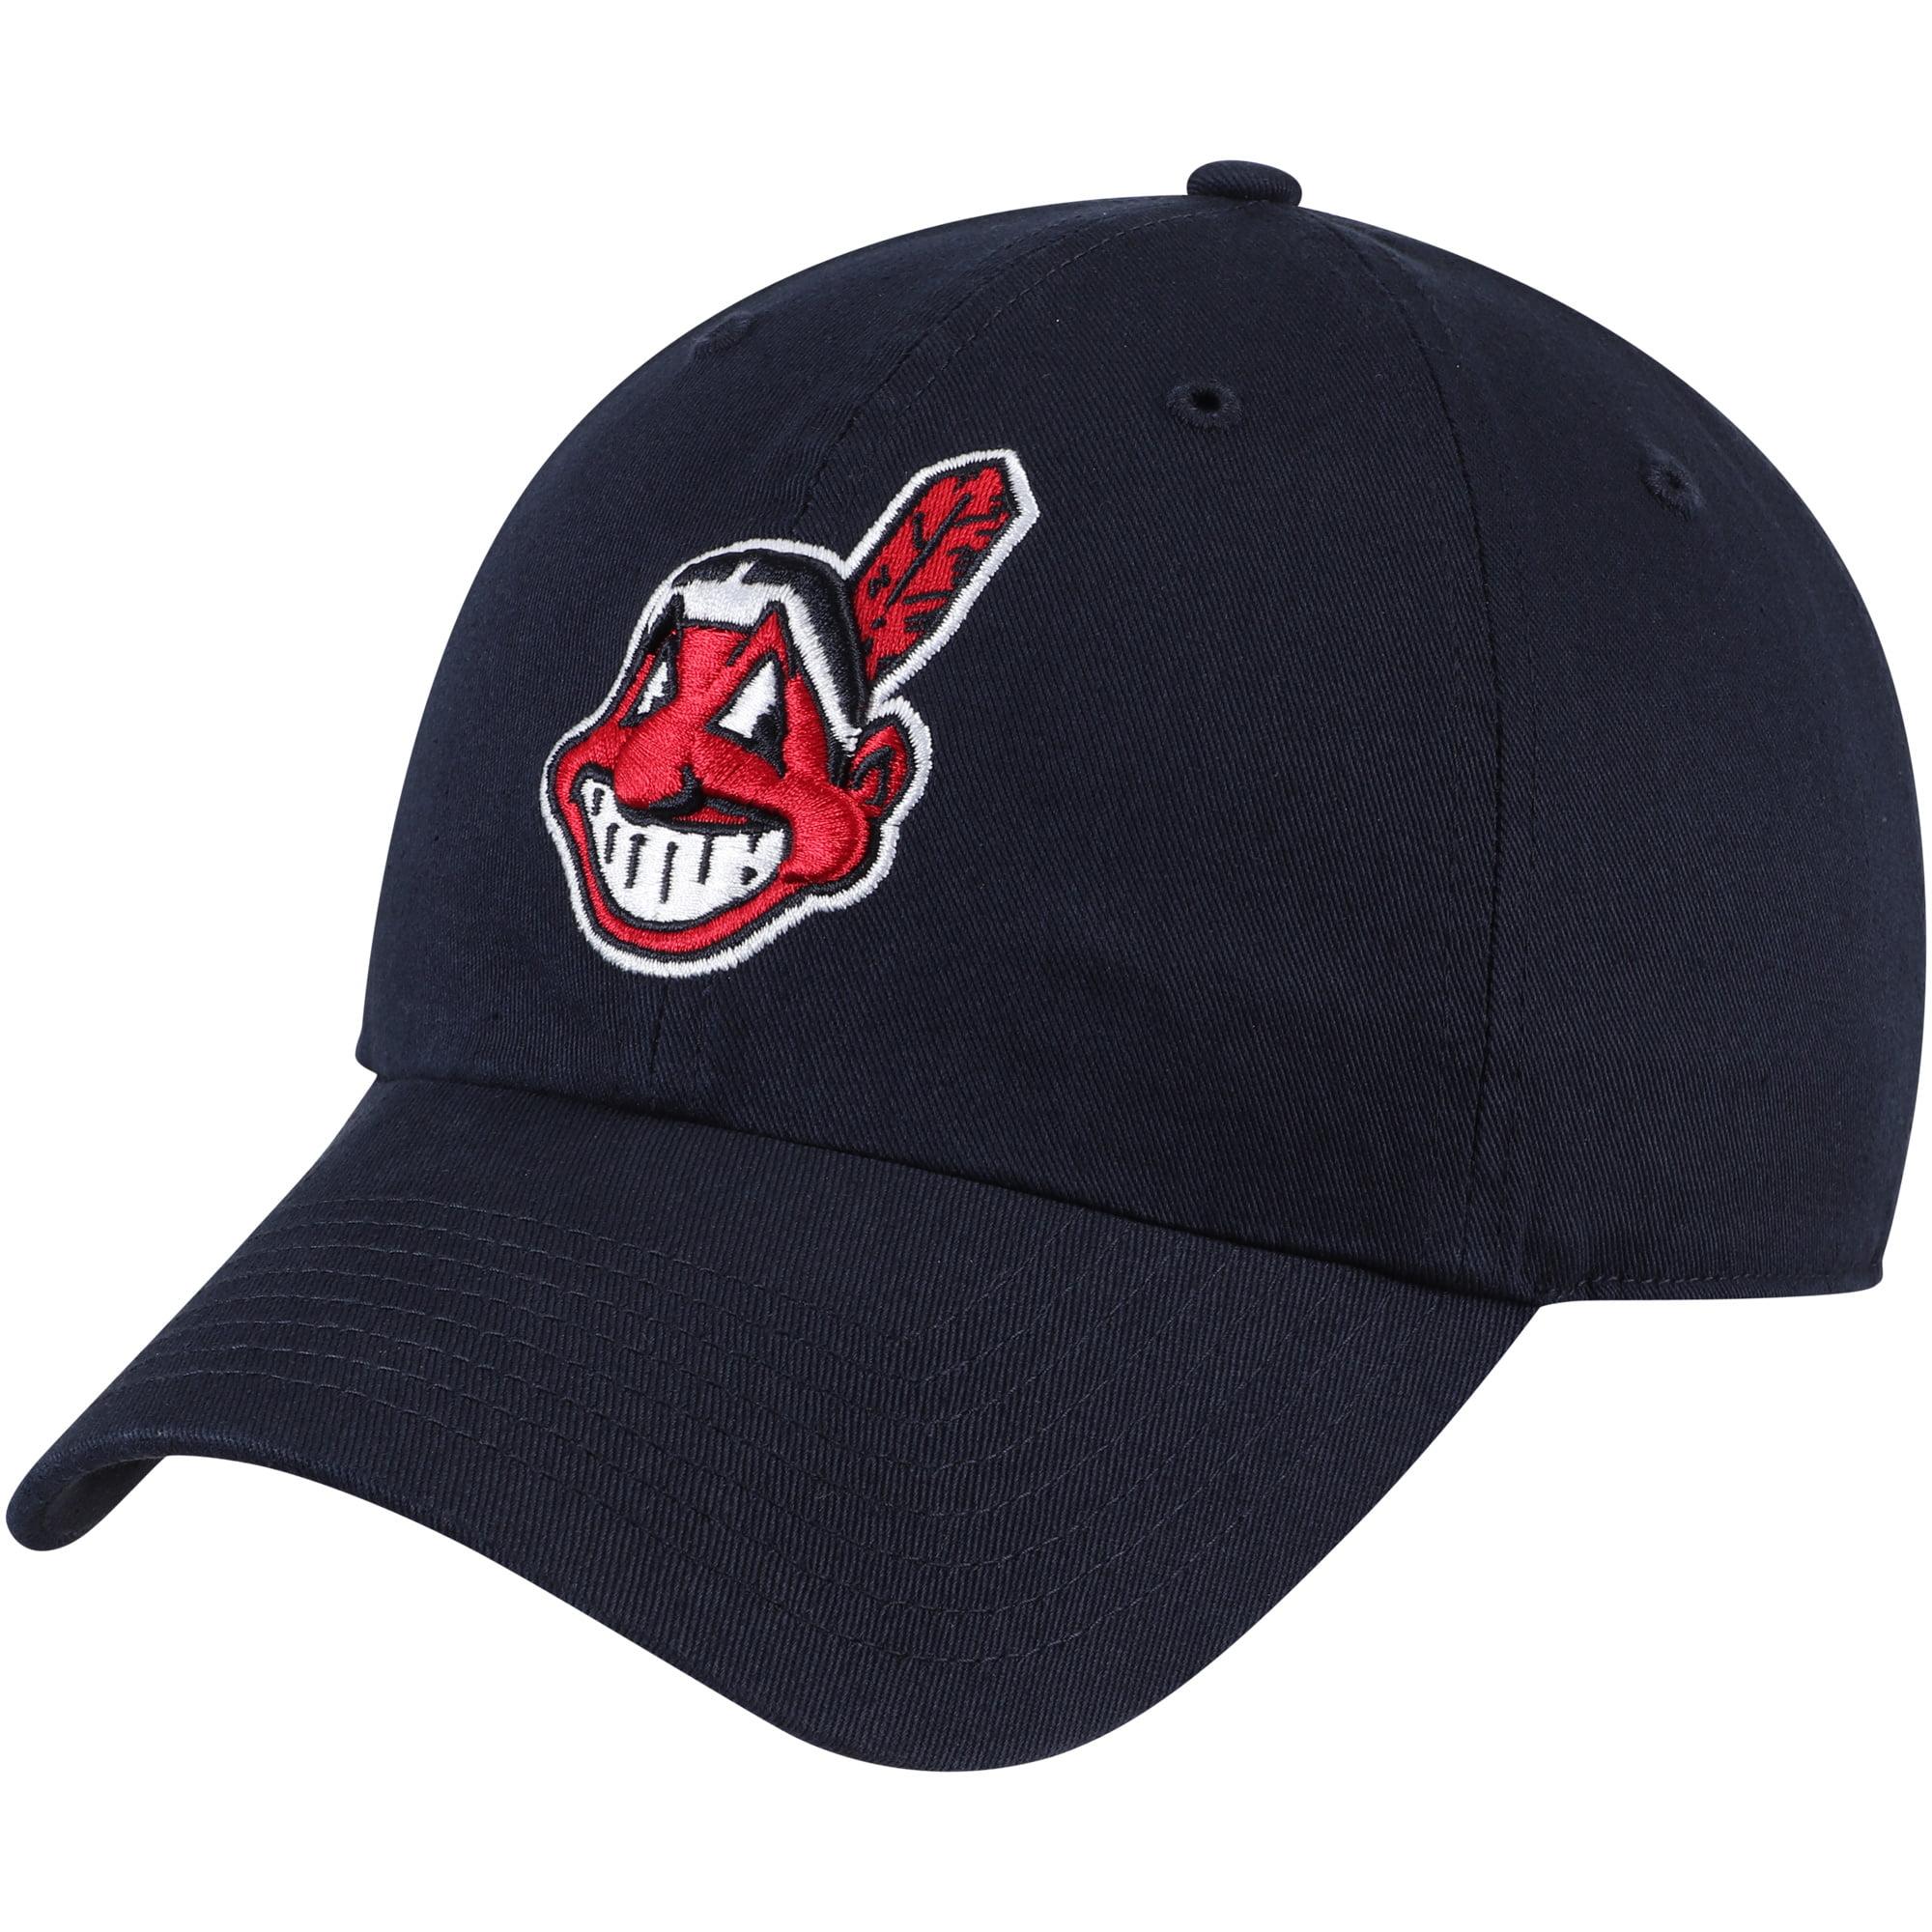 29127bc0 ... switzerland cleveland indians fan favorite primary logo clean up  adjustable hat navy osfa walmart 6e373 f479d